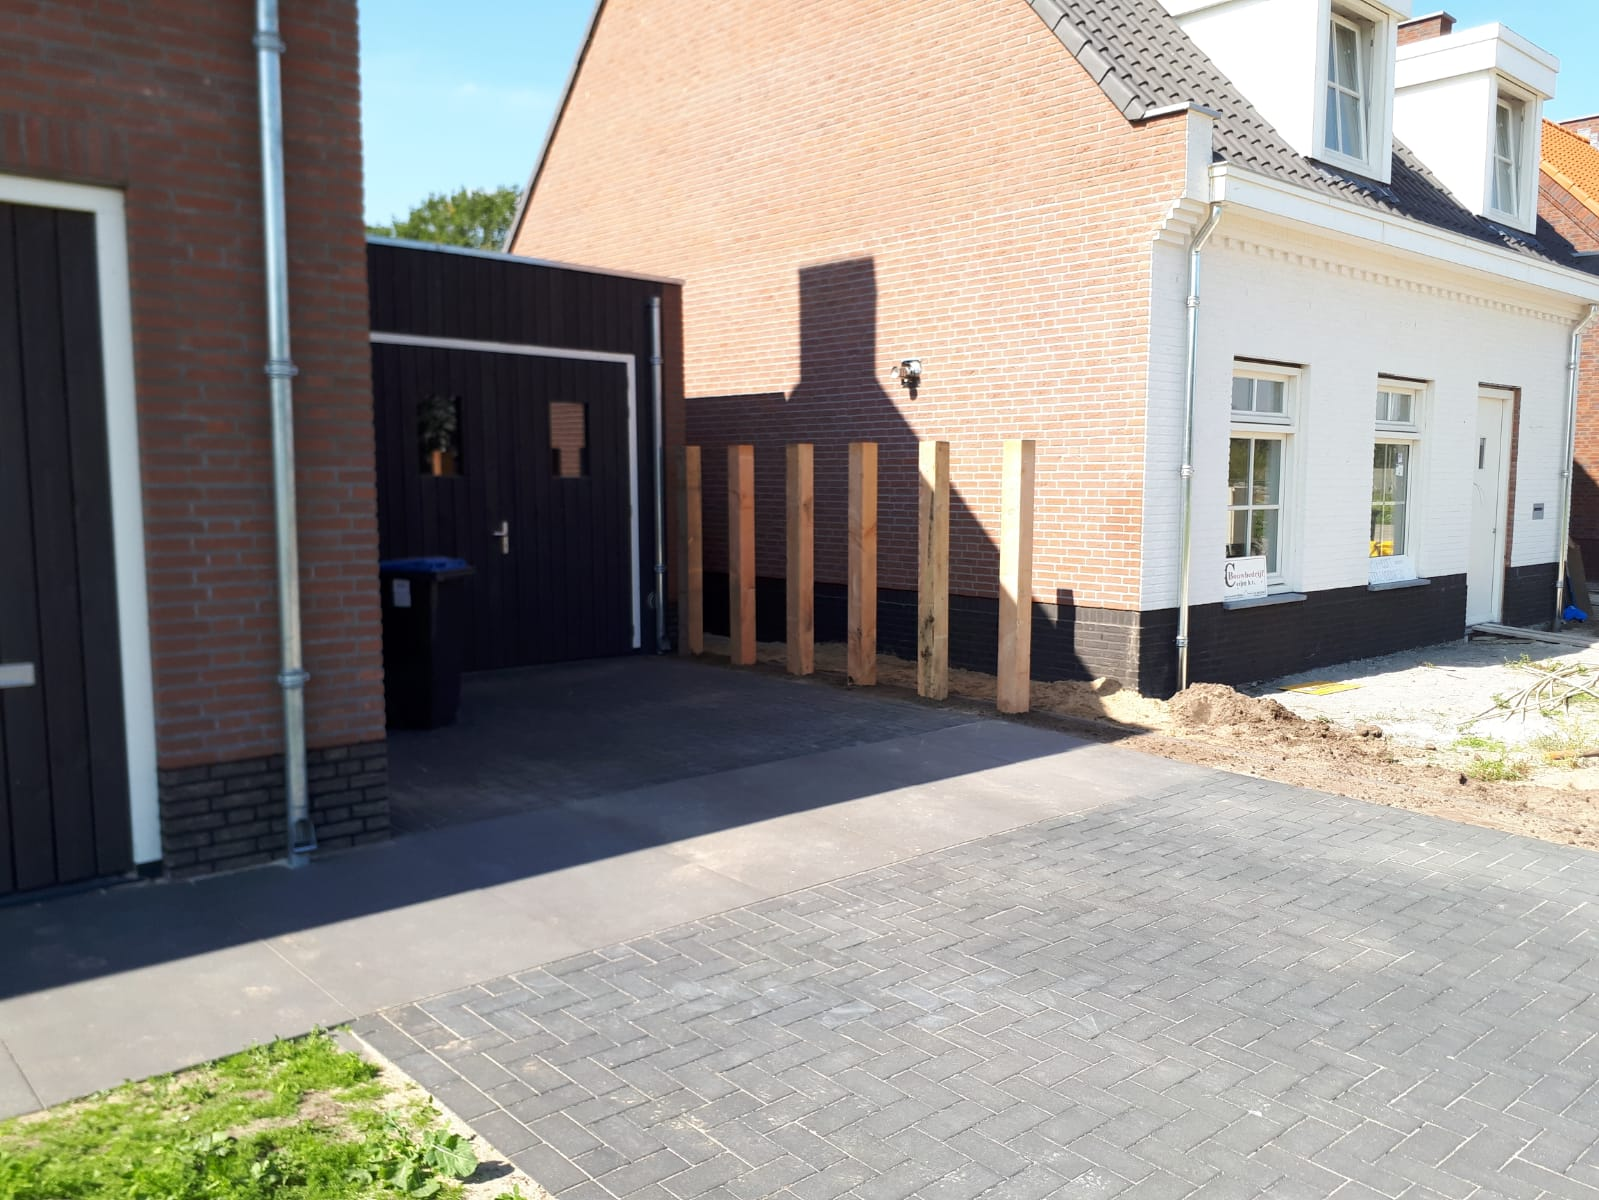 Bestrating Inclusief Leggen.Bestrating Leggen Nieuwbouw Woning Bestrating Leggen Nieuwbouw